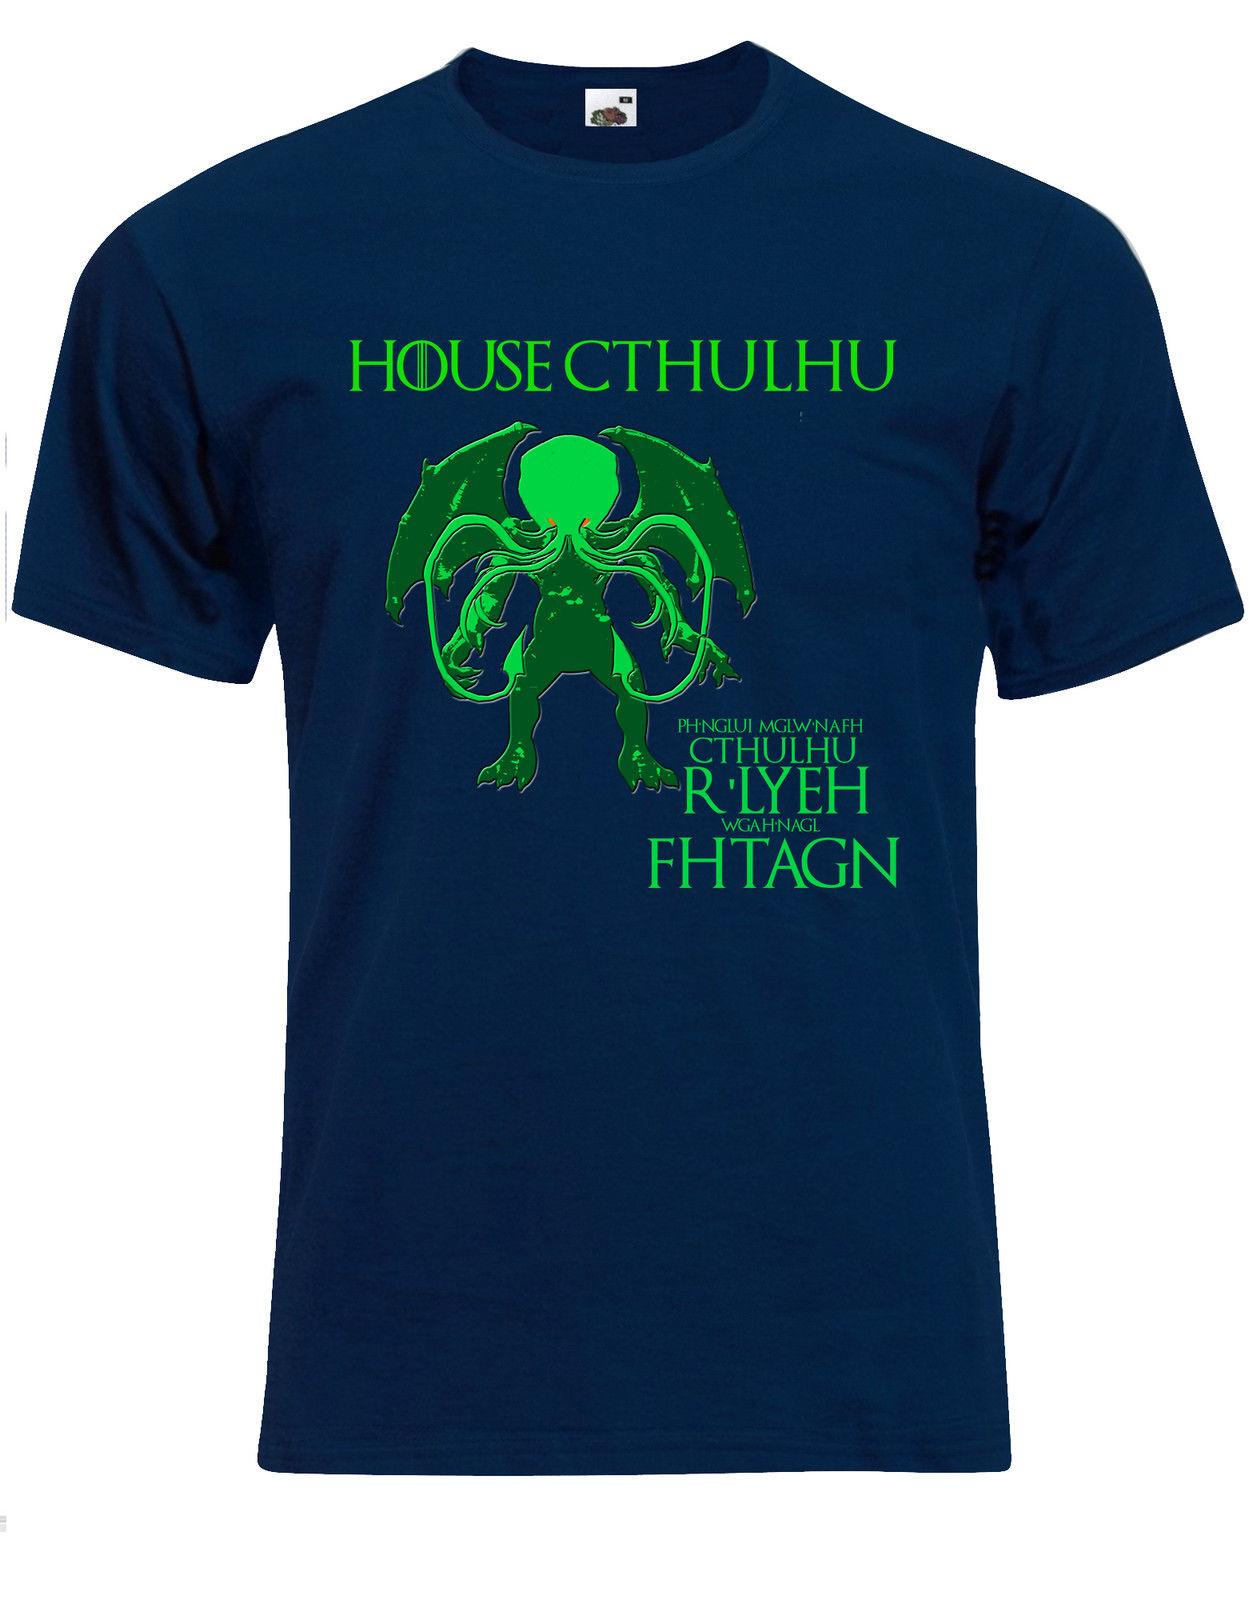 Casa Cthulhu tiene Greyjoy parodia durmiente de Rlyeh H P para hombre Camiseta Tee superior AG49Cool Casual de moda Unisex camiseta envío gratis